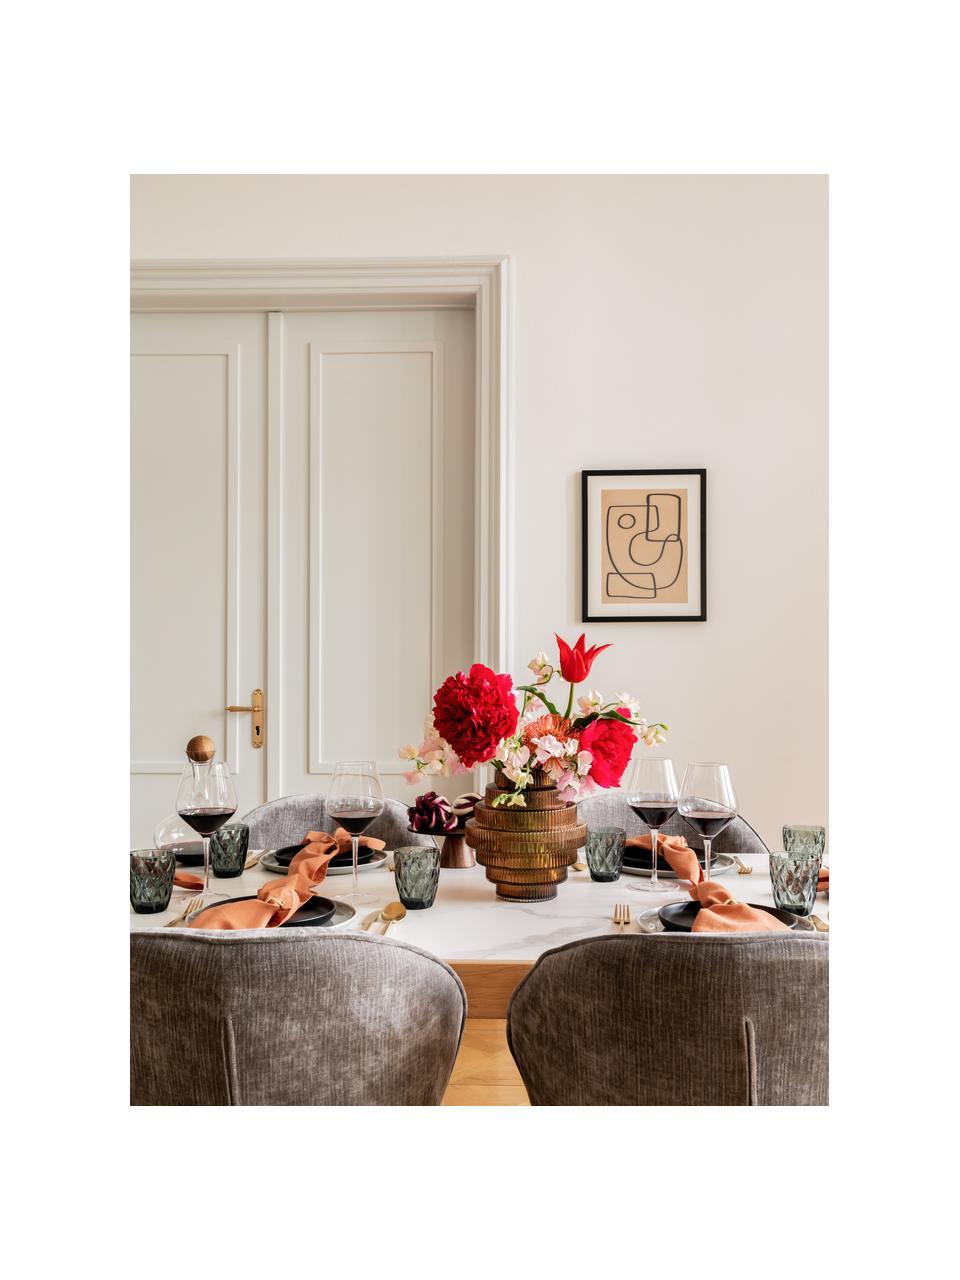 Mundgeblasene bauchige Rotweingläser Ays, 4 Stück, Glas, Transparent, Ø 7 x H 25 cm